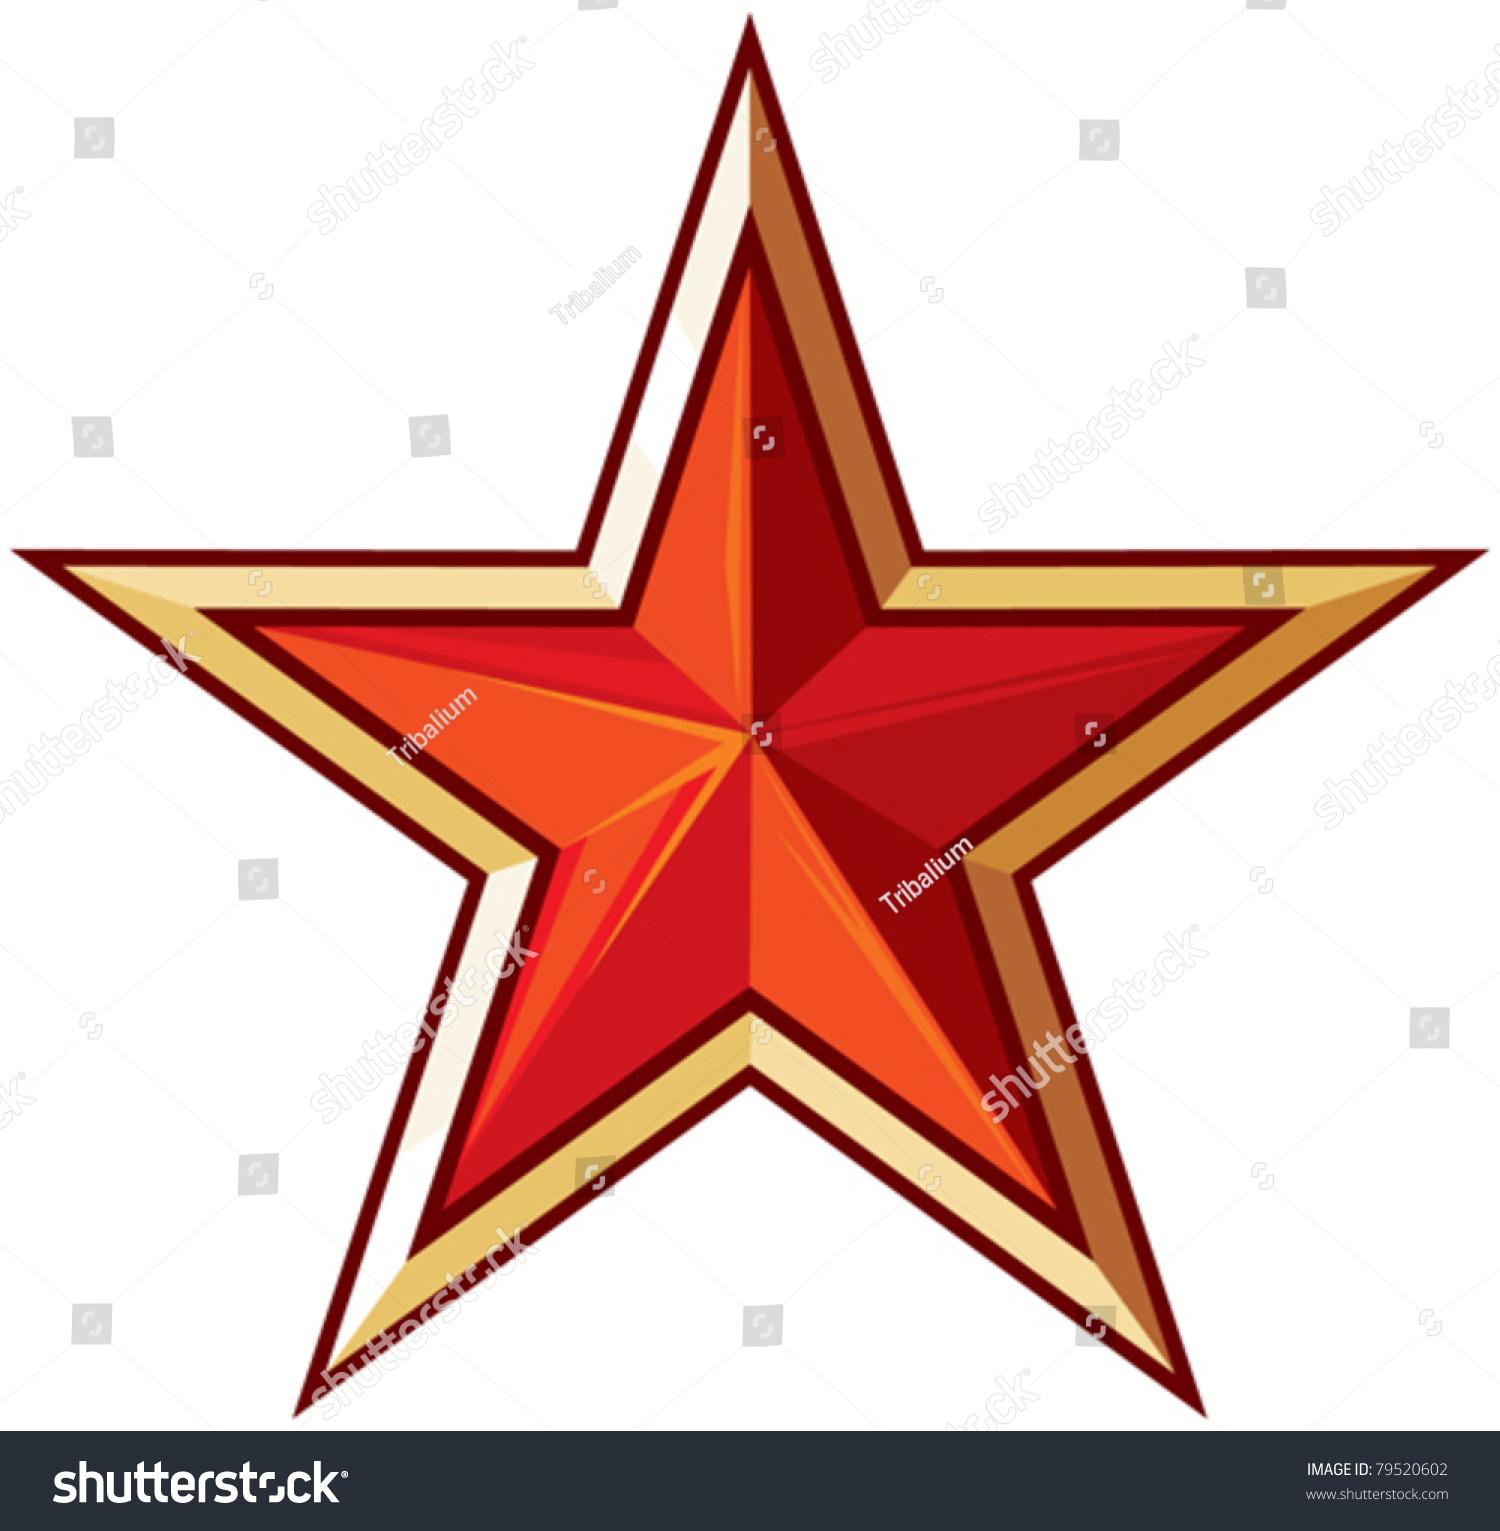 Soviet star and laurel wreath vector by Tribaliumvs - Image ...